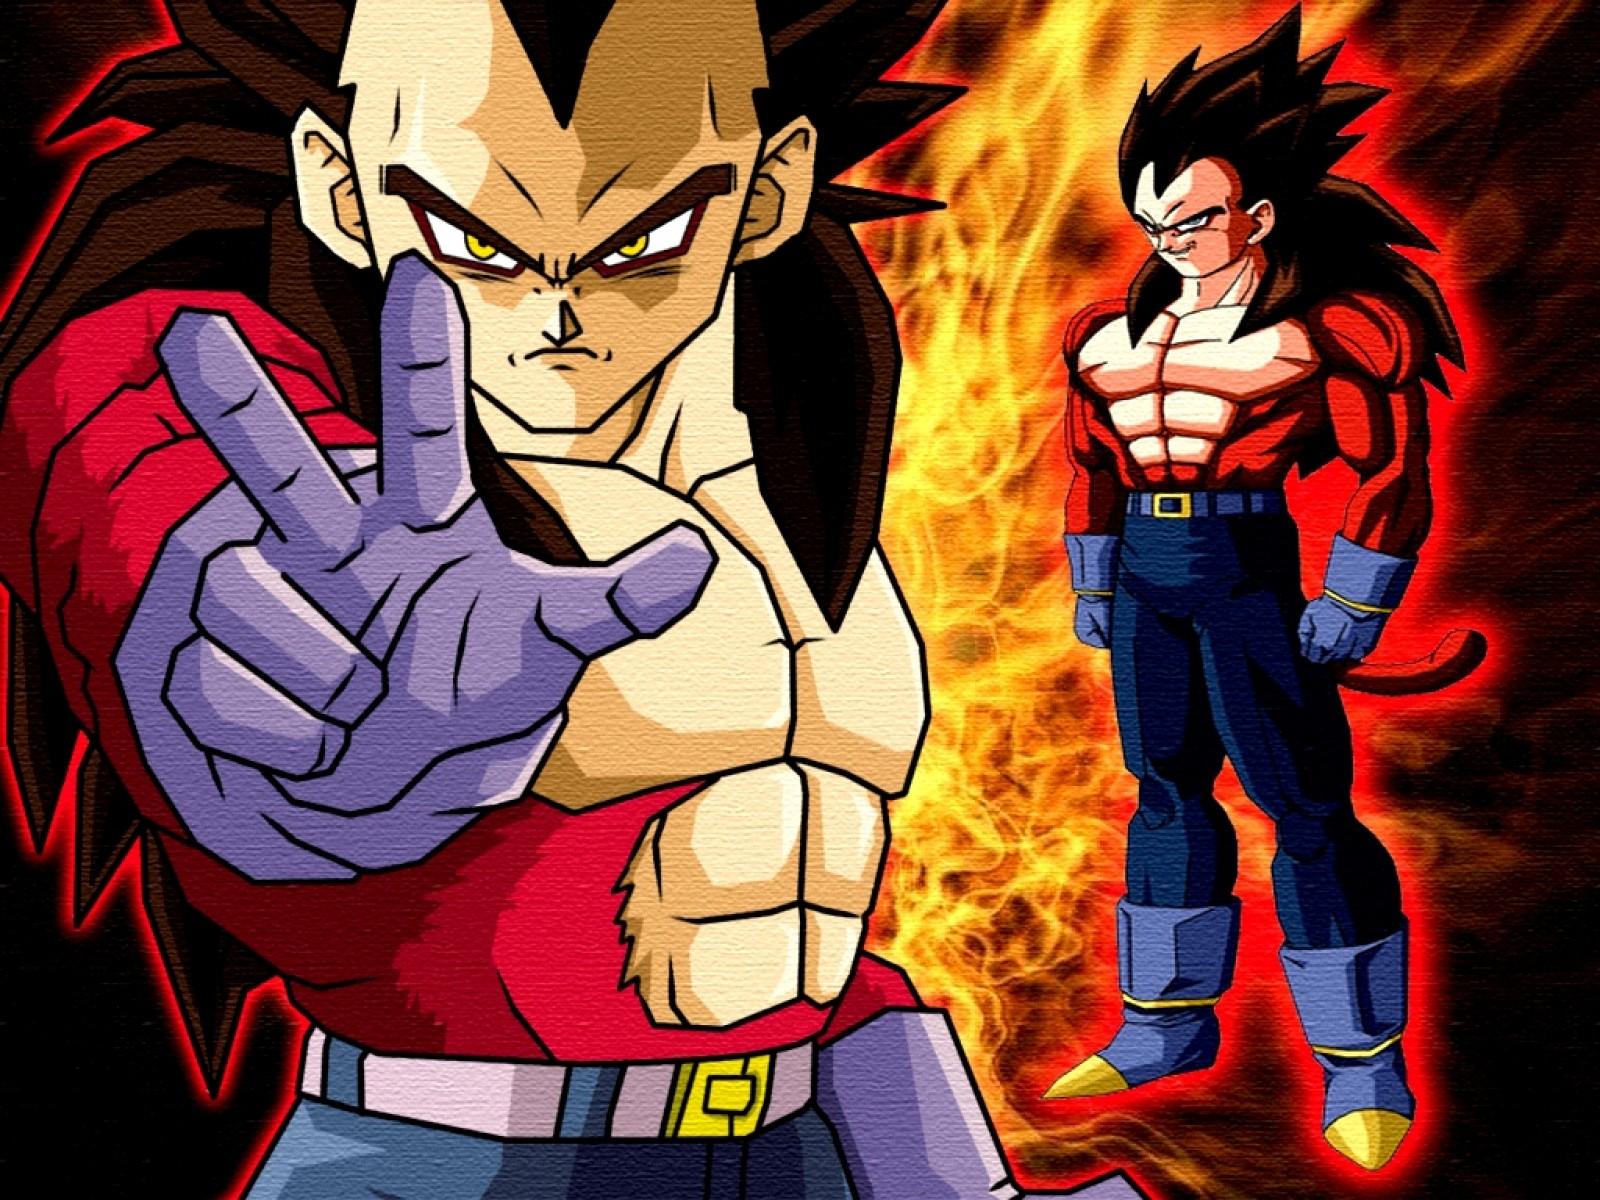 Goku Super Saiyan 4 Hd Wallpaper Sf Wallpaper